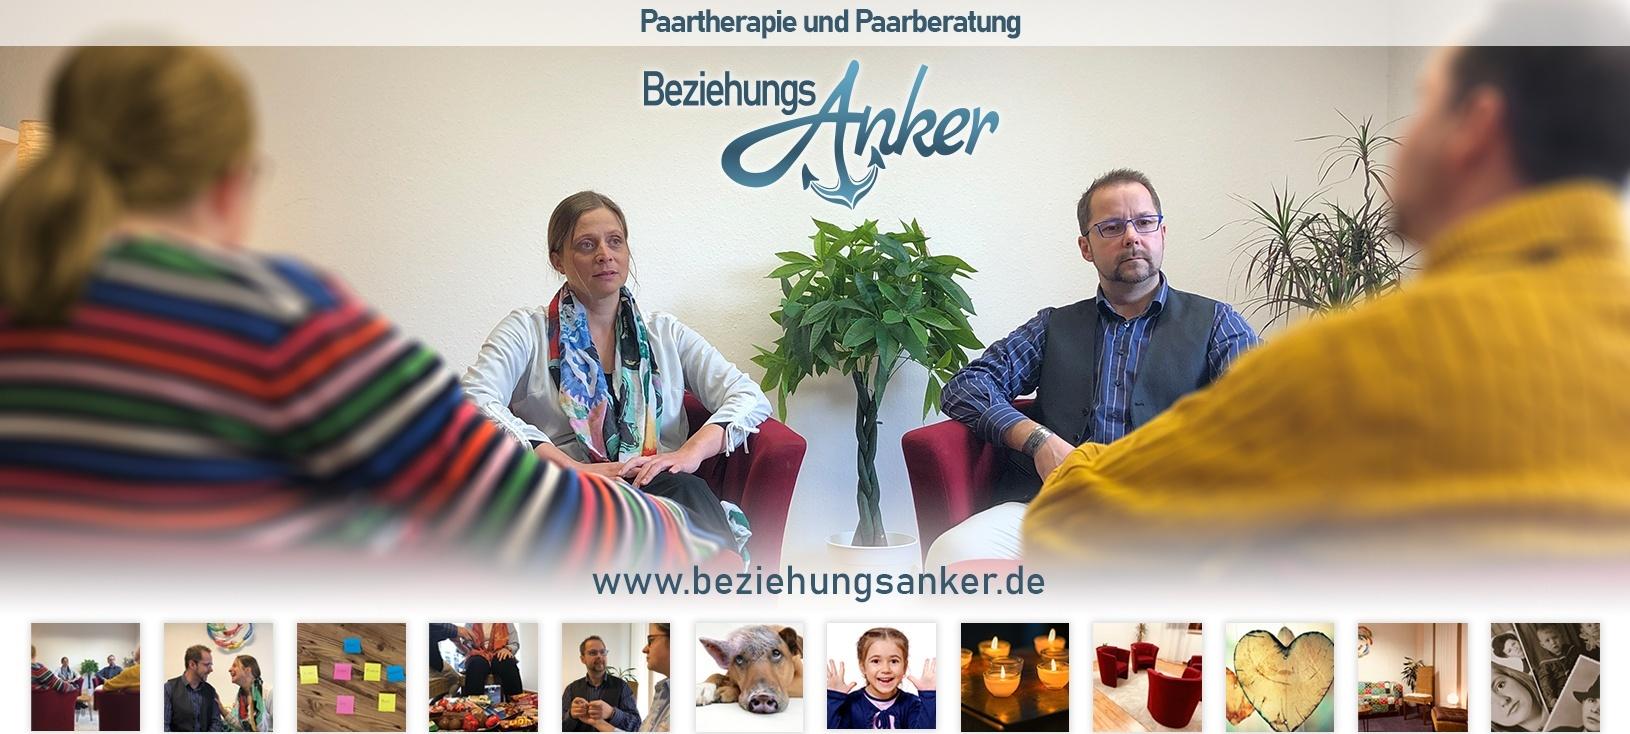 BeziehungsAnker - Paartherapie, Paarberatung Hamburg